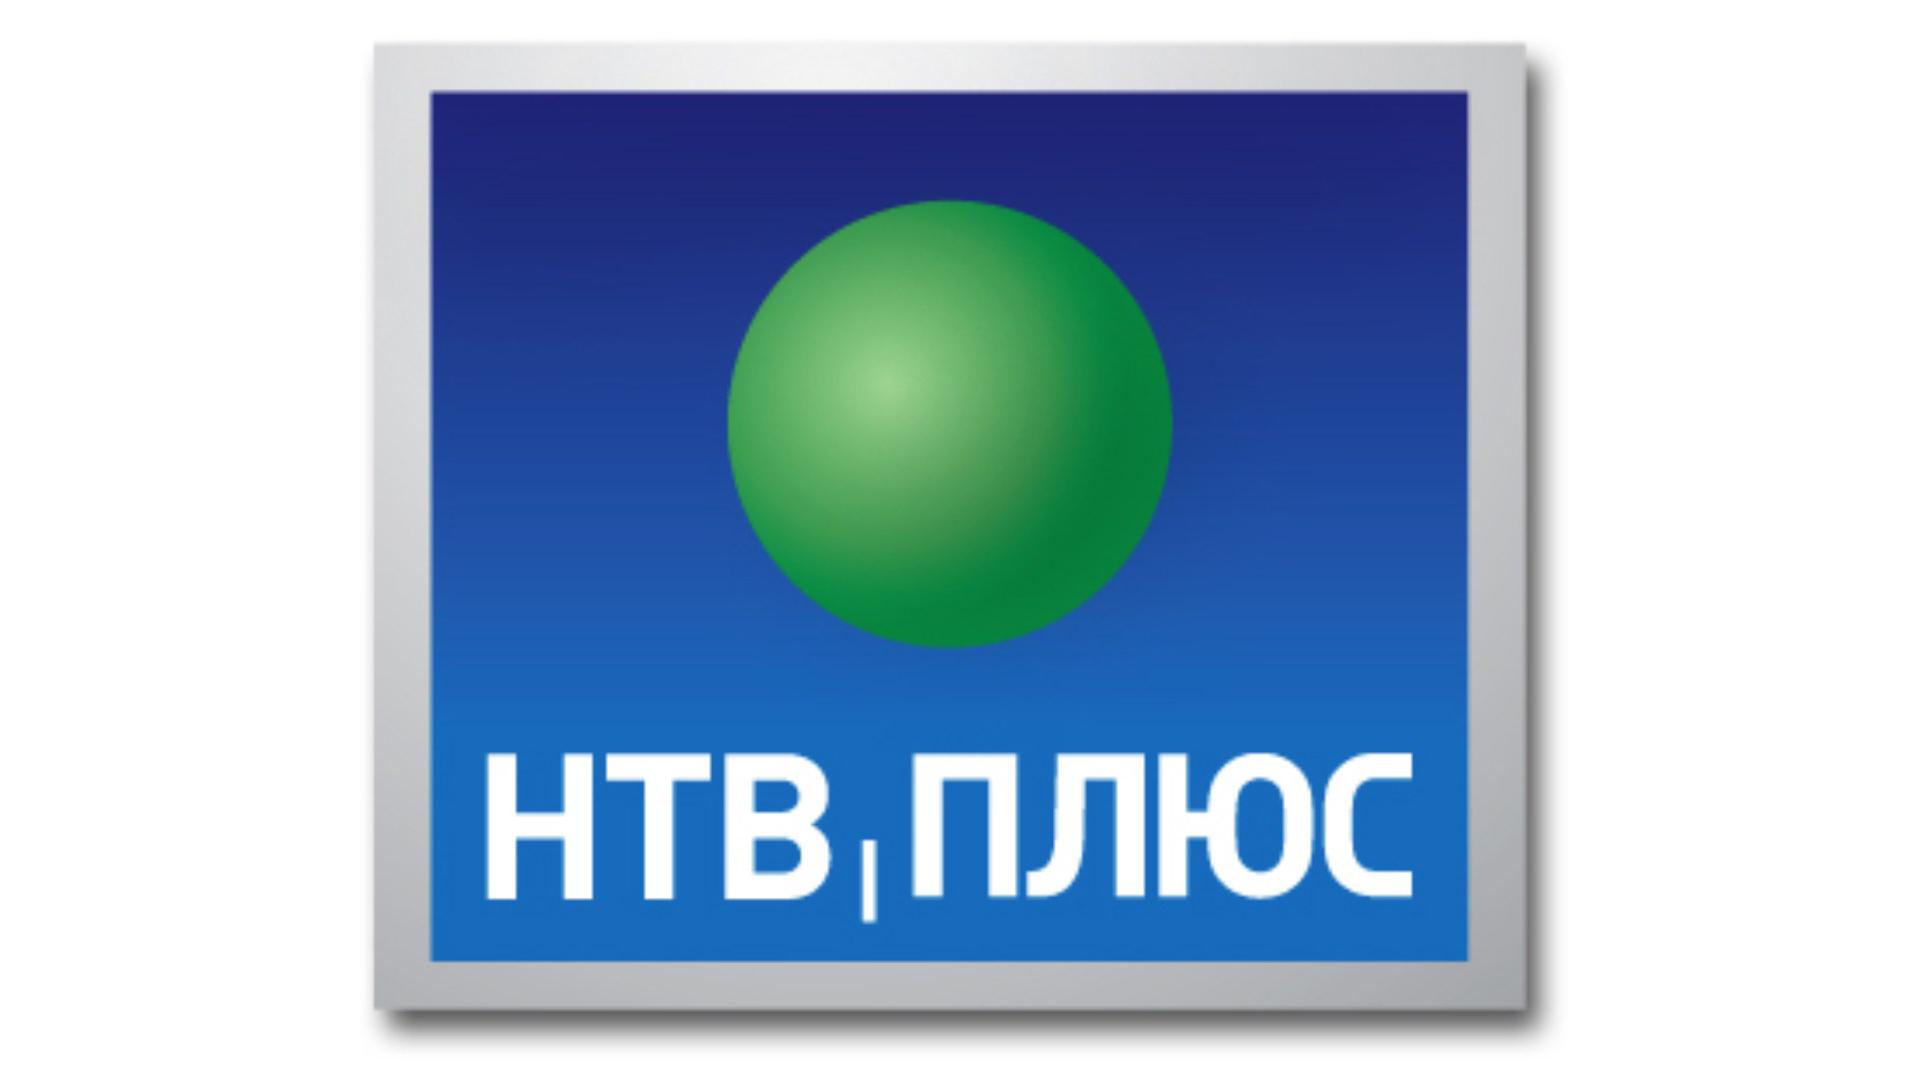 Спутниковые каналы телеканалы нтв онлайн бесплатно 3 фотография